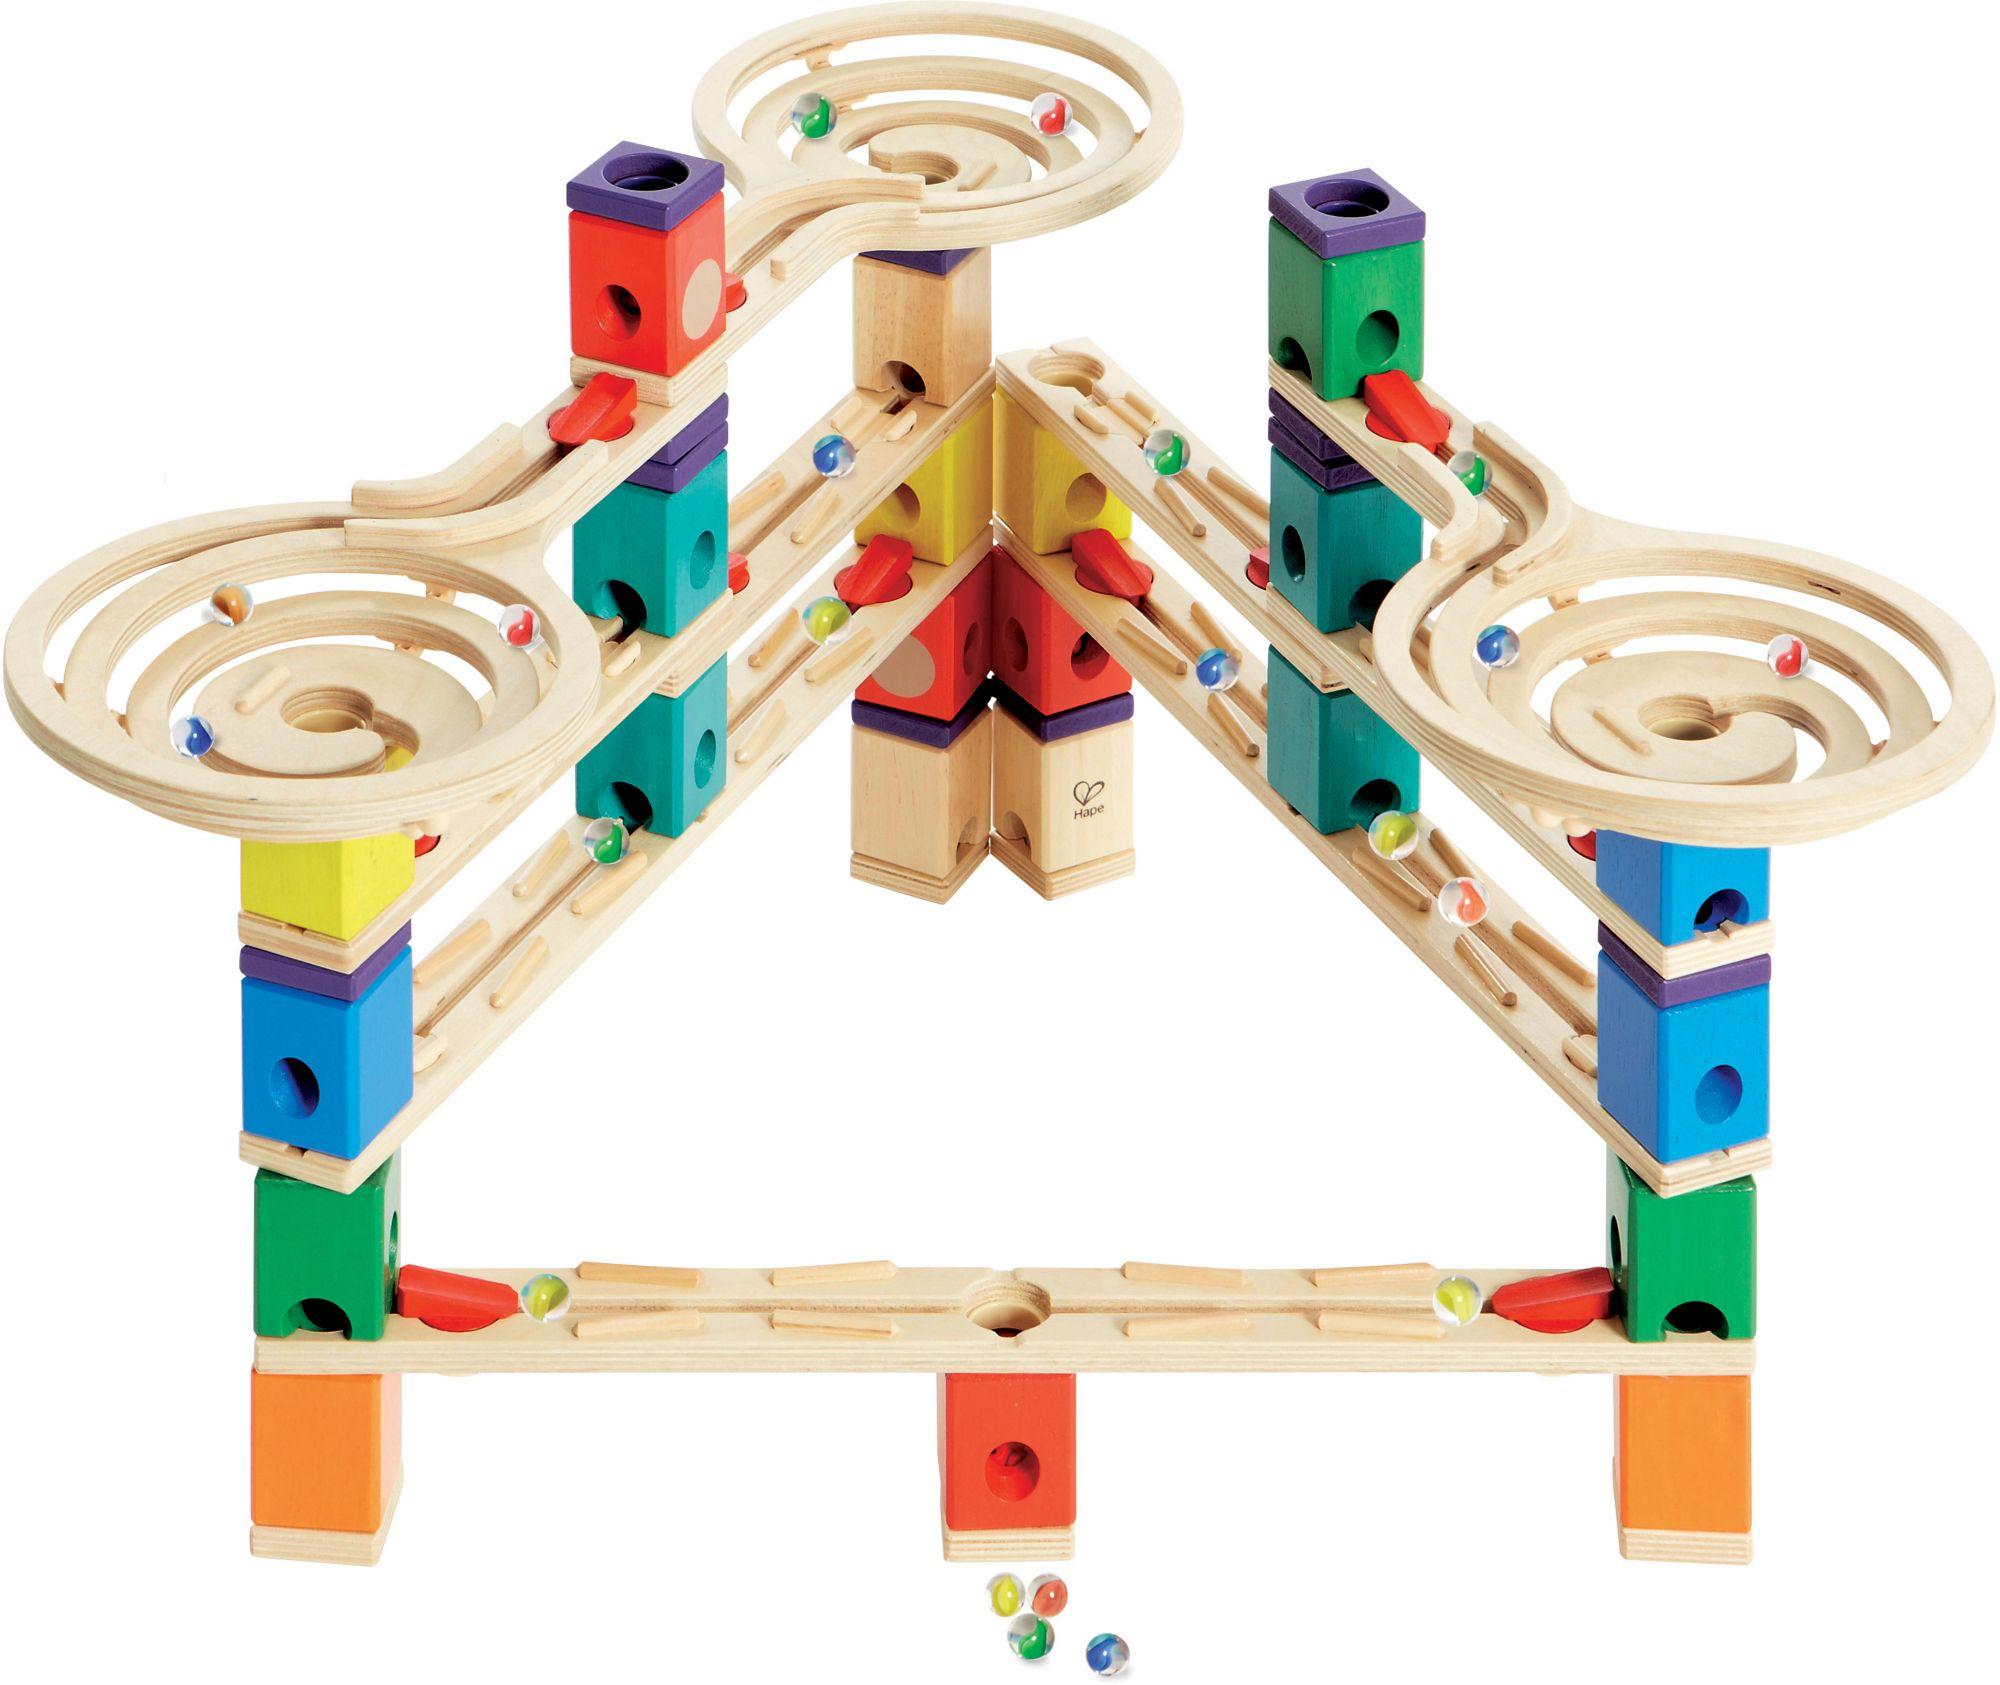 HAPE Hape Kugelbahn aus Holz, »Quadrilla Vertigo«